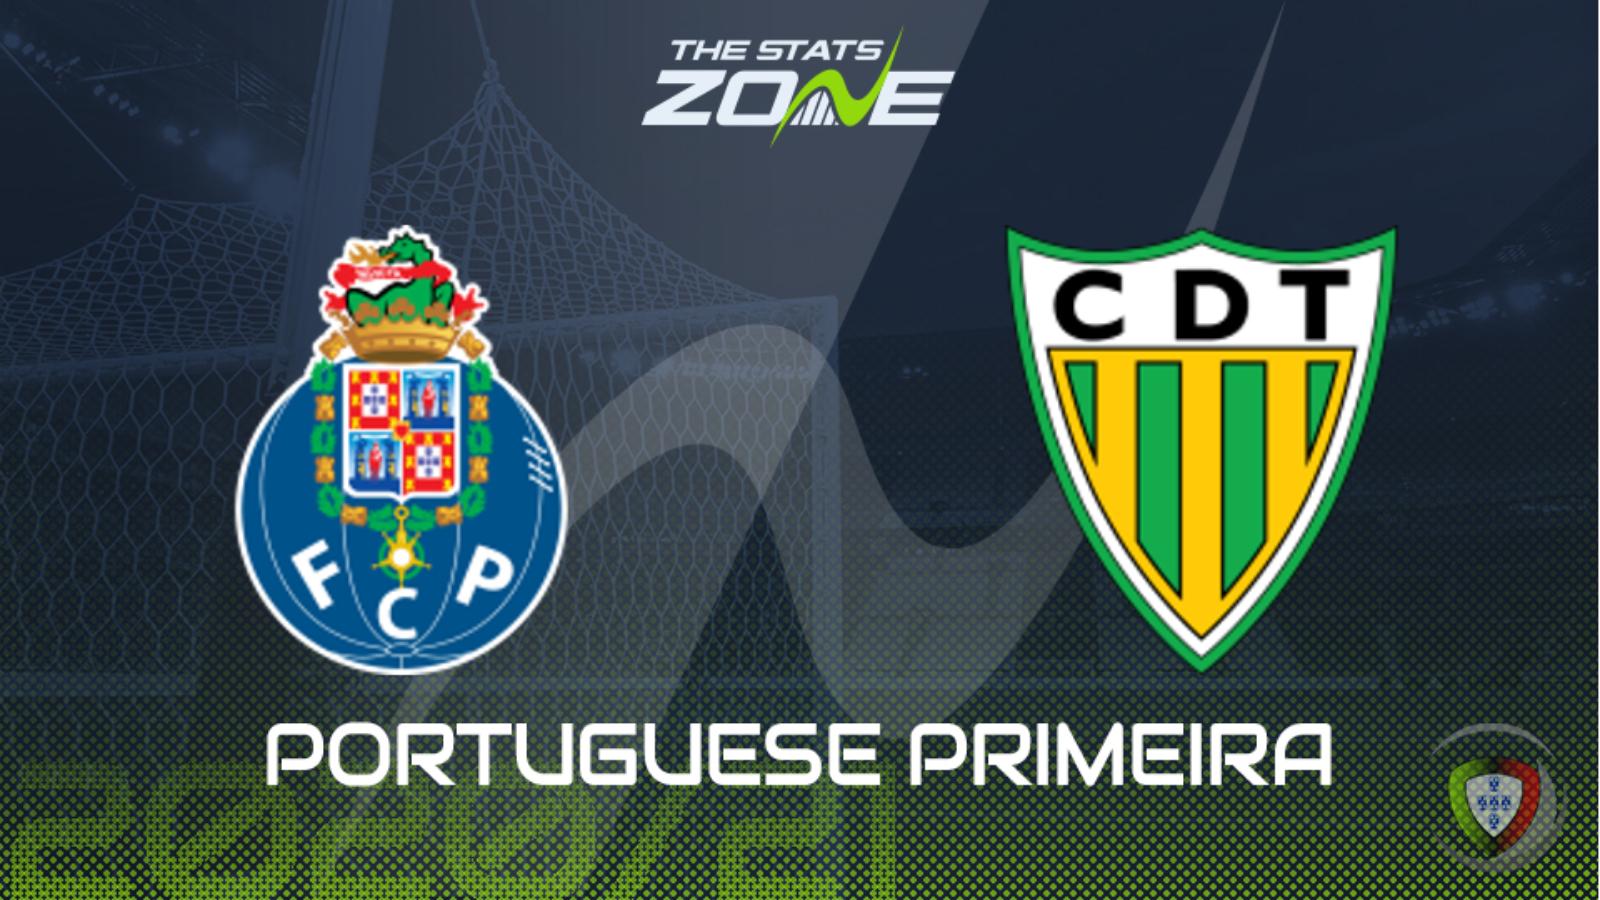 2020-21 Portuguese Primeira Liga - FC Porto vs Tondela Preview & Prediction - The Stats Zone